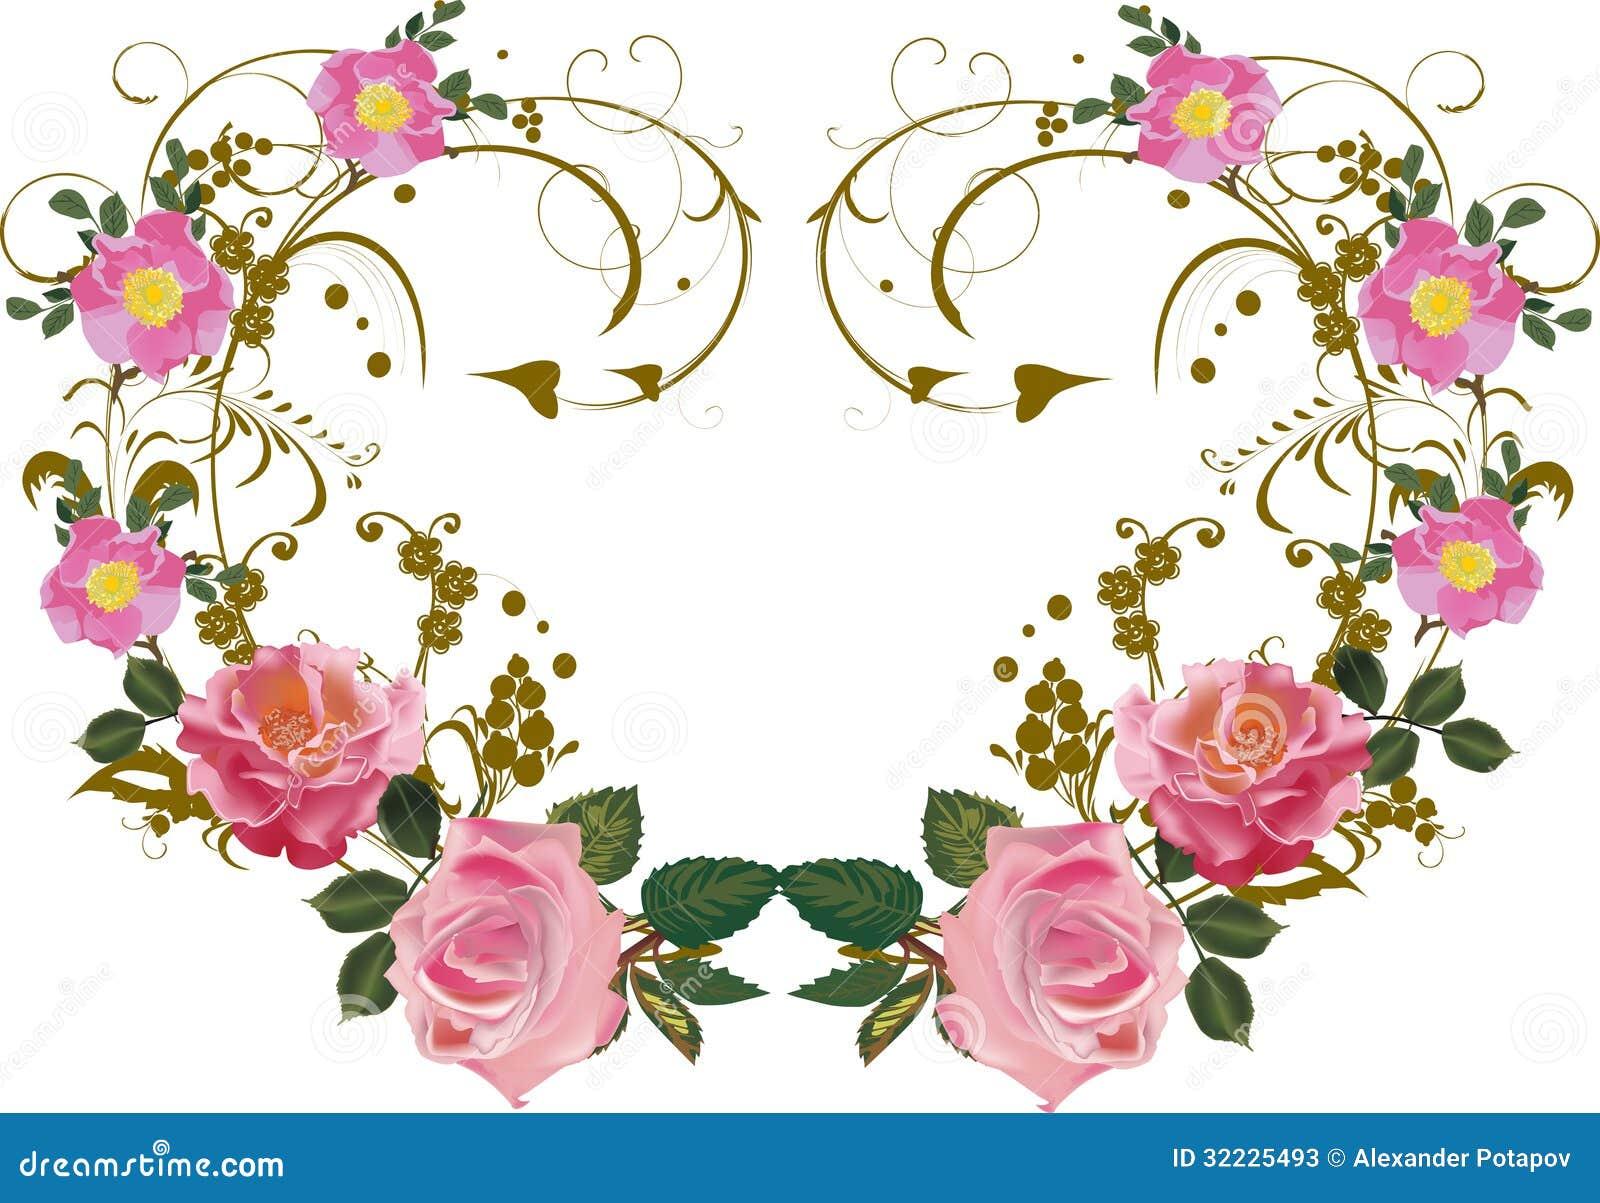 Pink rose flower symmetric decoration stock vector illustration of pink rose flower symmetric decoration mightylinksfo